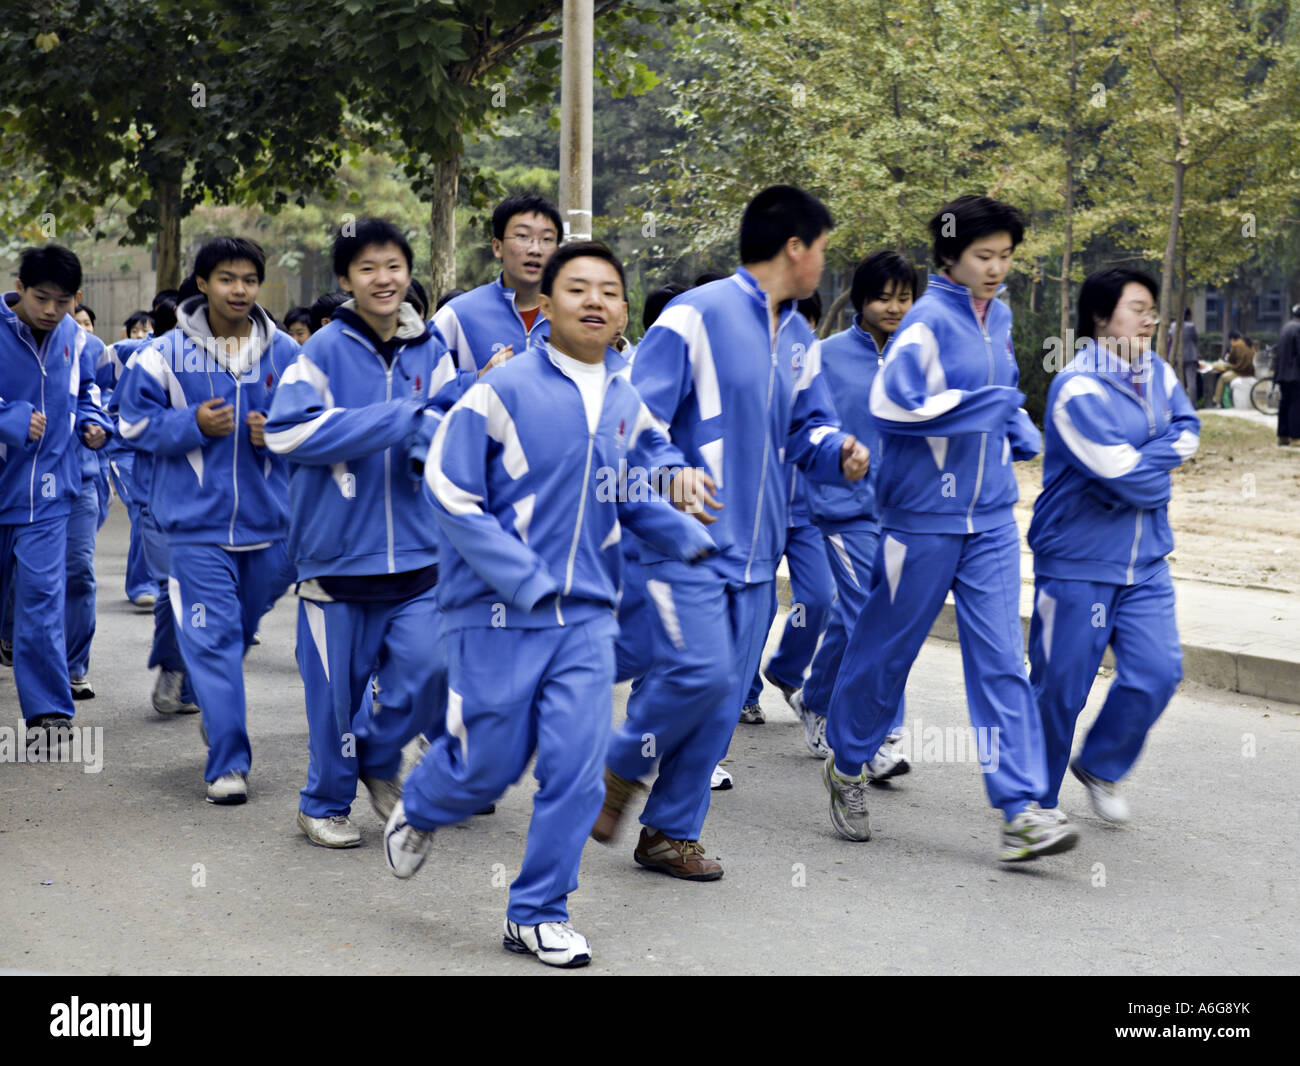 China Beijing High School Physical Education Class